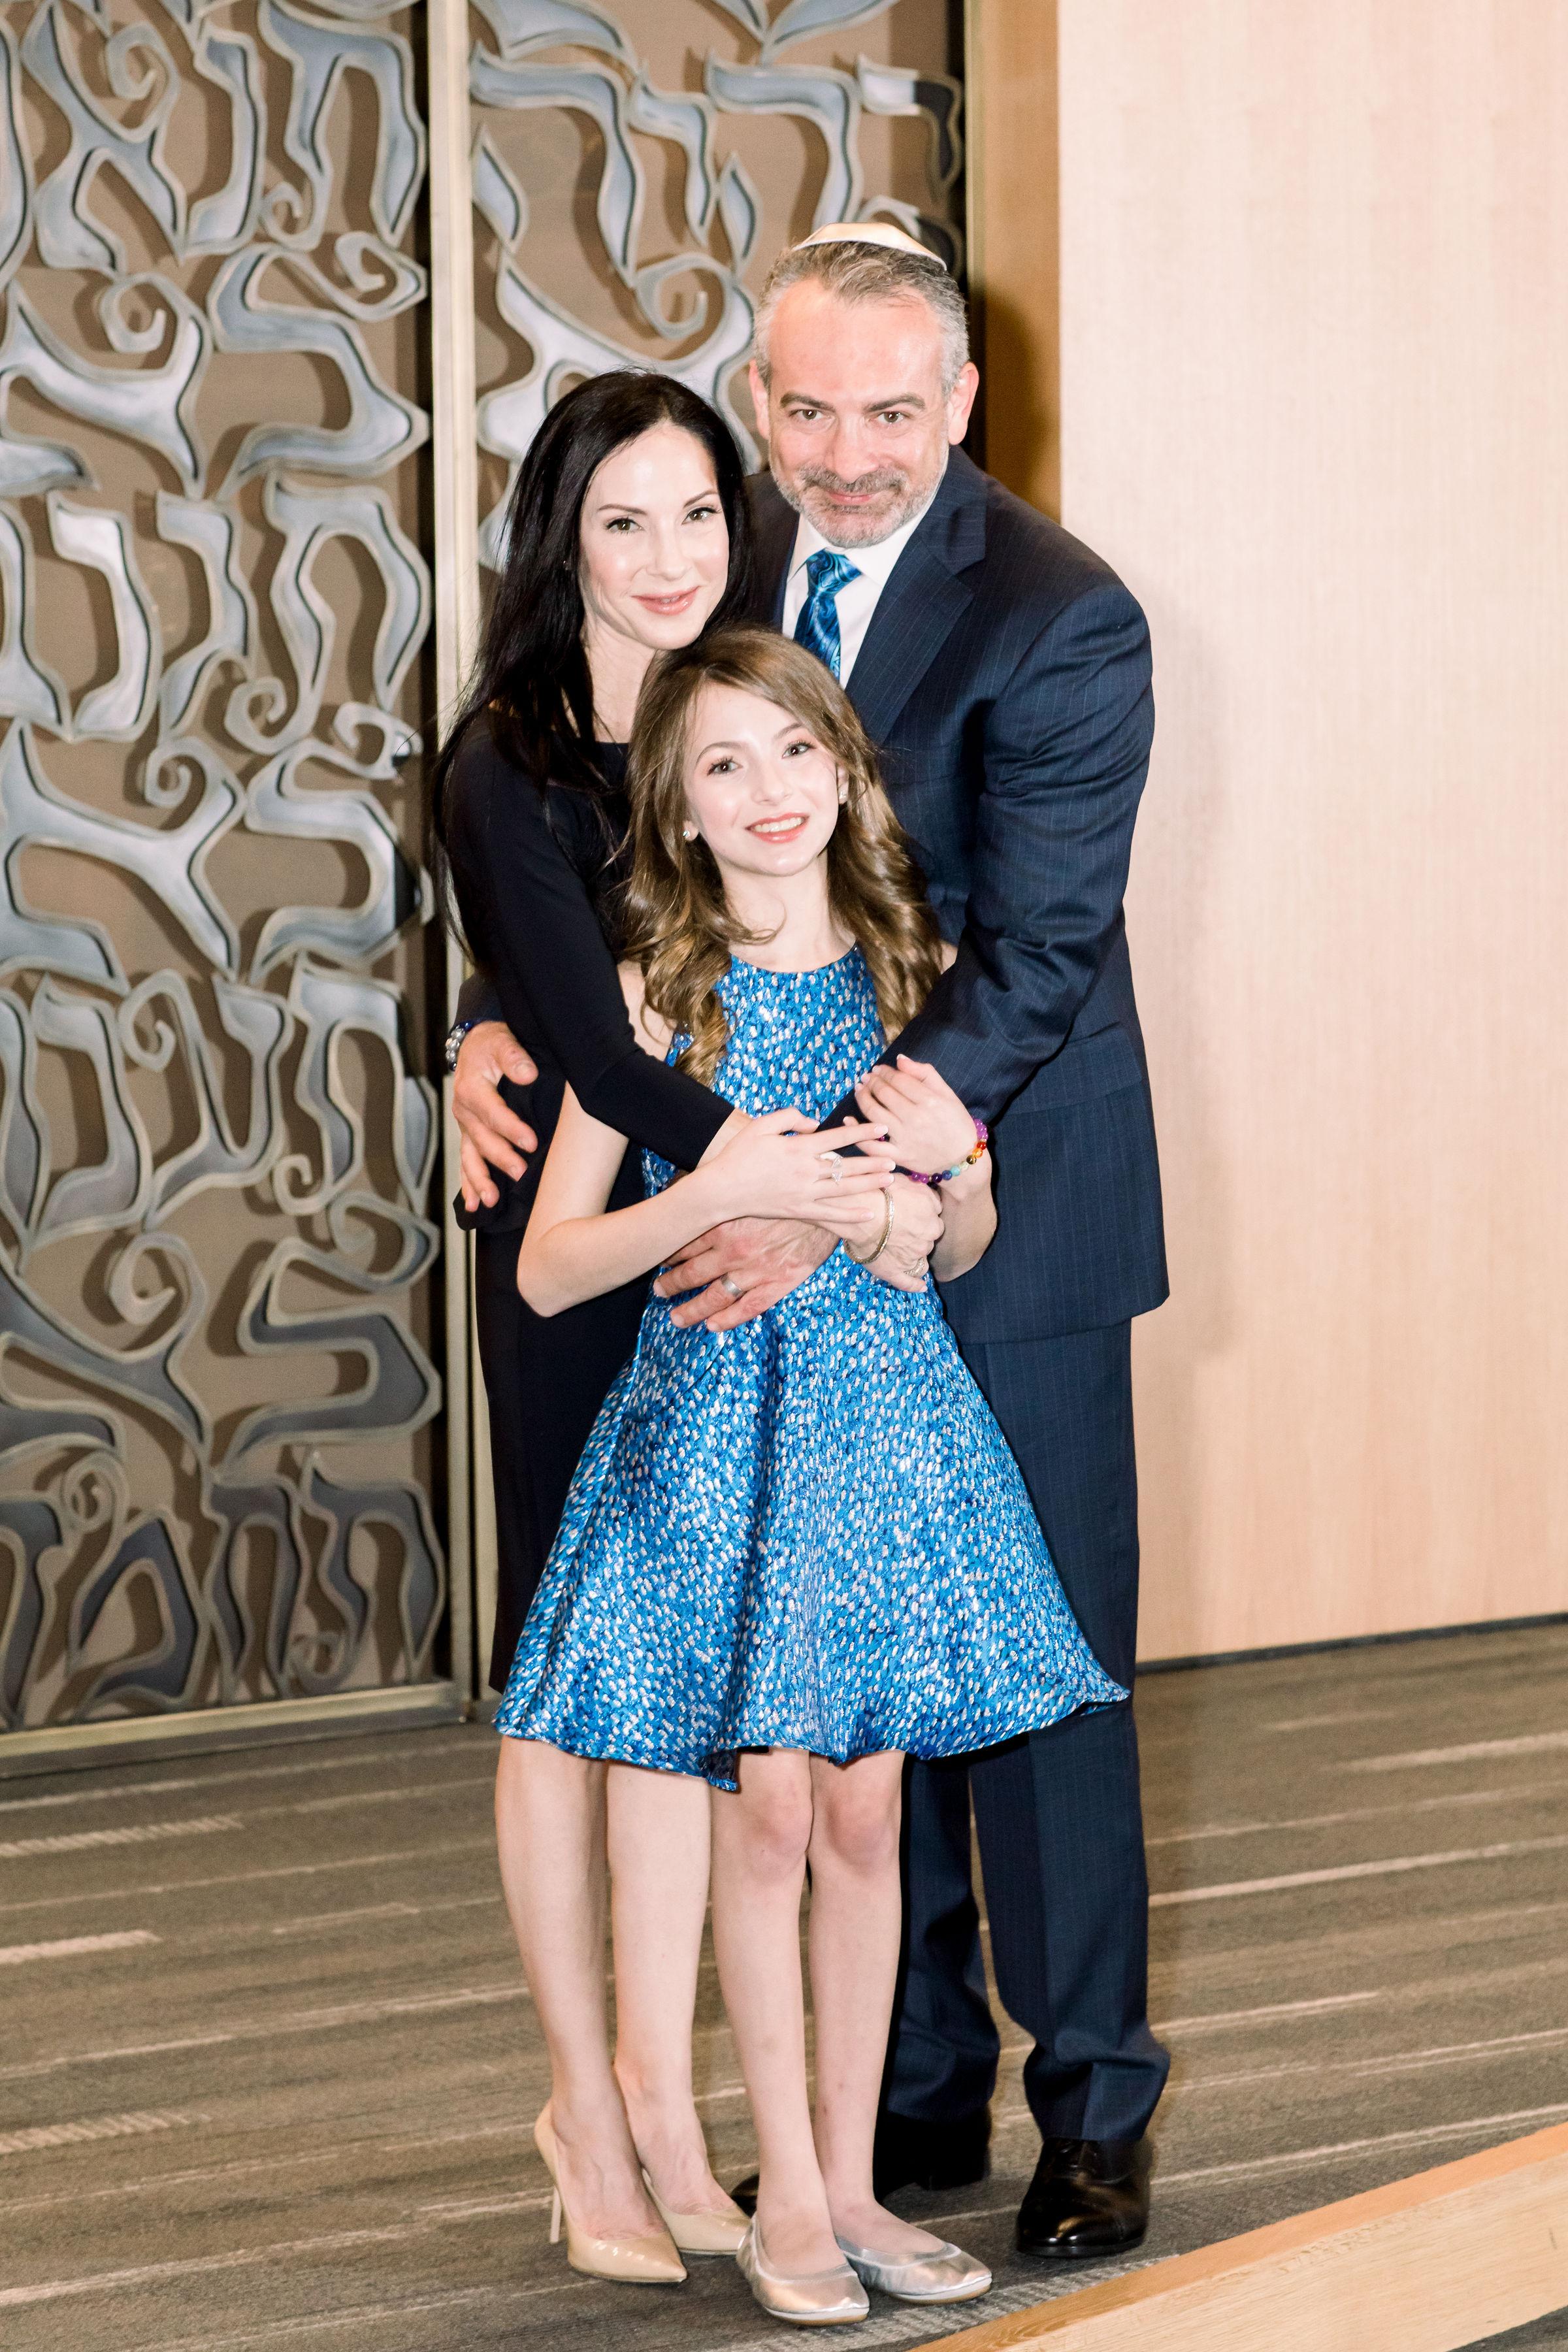 2 bat mitzvah family mom dad bat mitzvah girl temple Life Design Events photos by Stephanie Heymann Photography.jpg